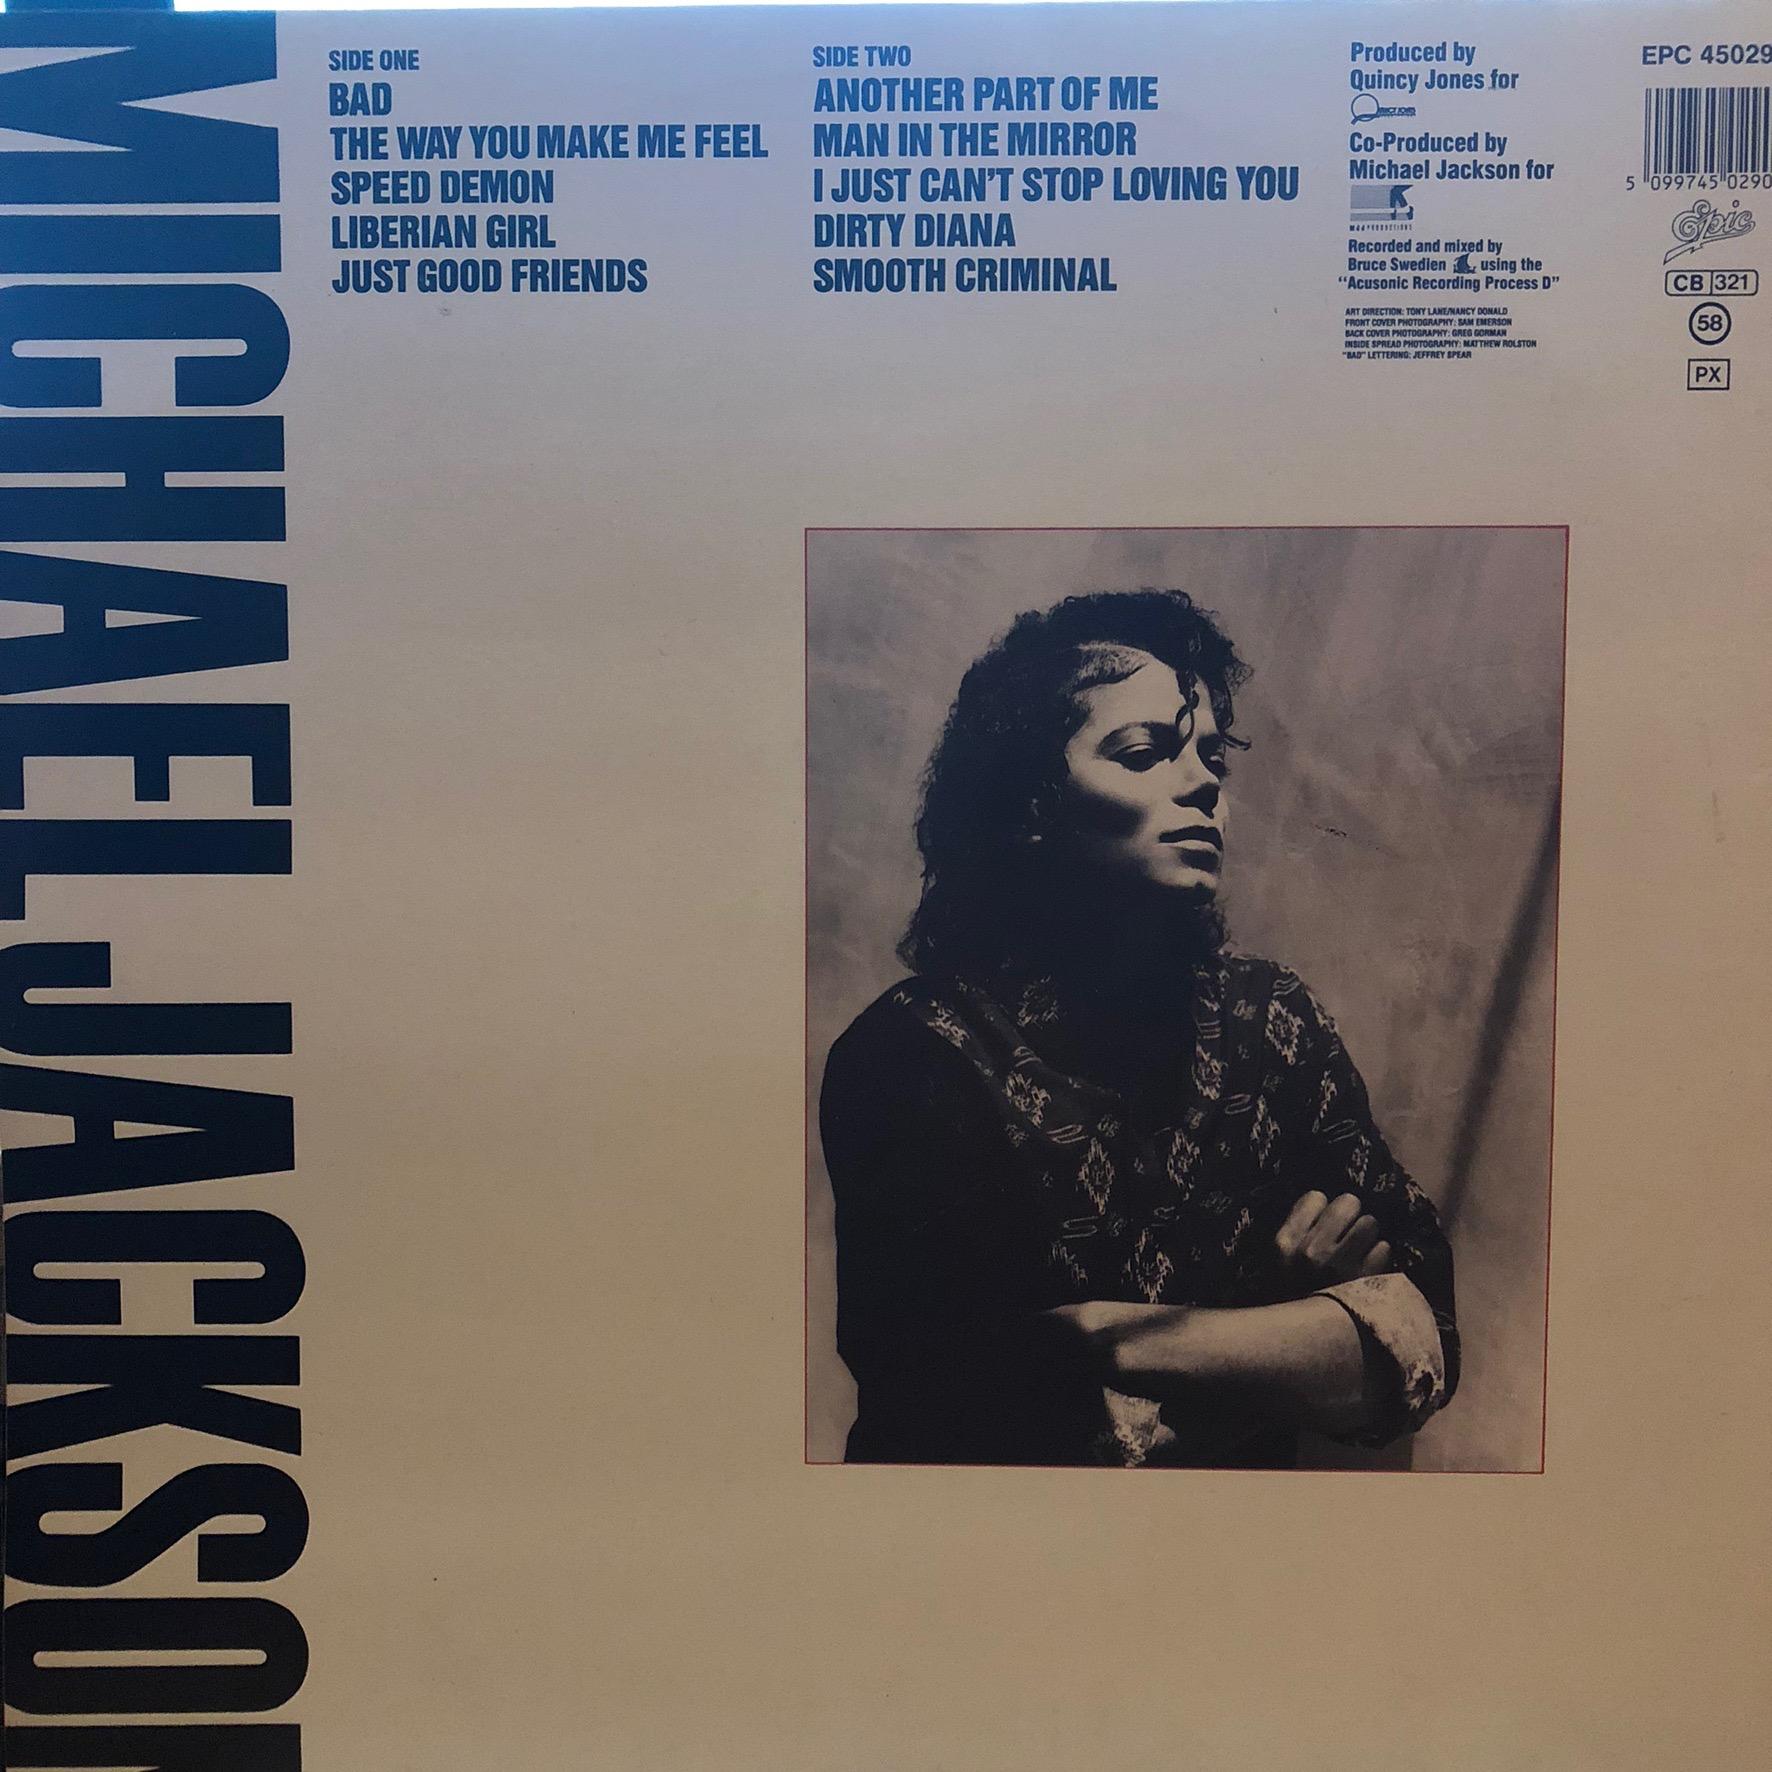 Michael Jackson - Bad - Cover